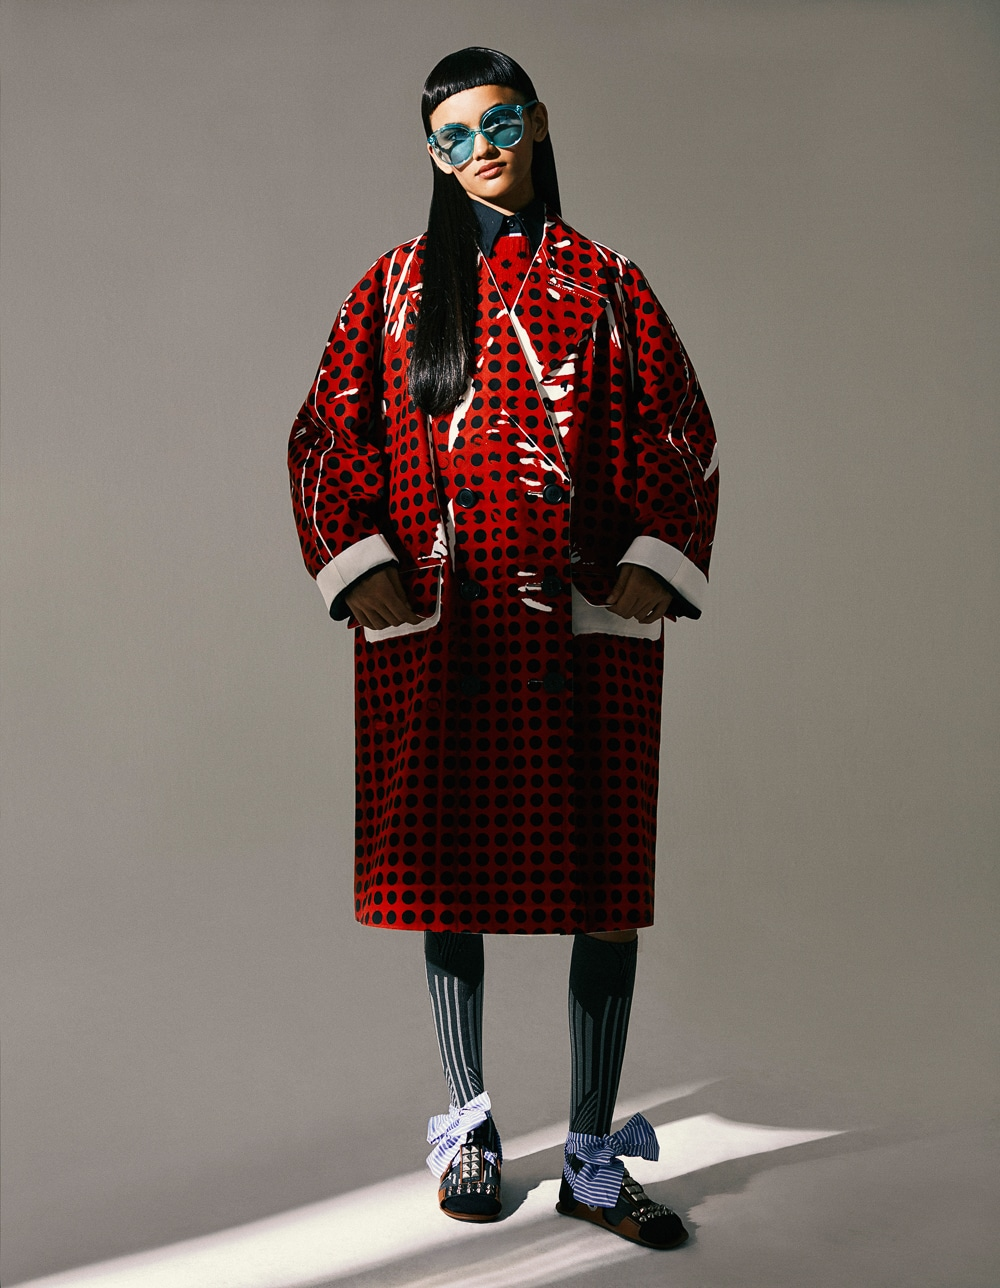 Harpers-Bazaar-Brazil-Cris-Lopes-Ivan-Erick-Menezes-6.jpg